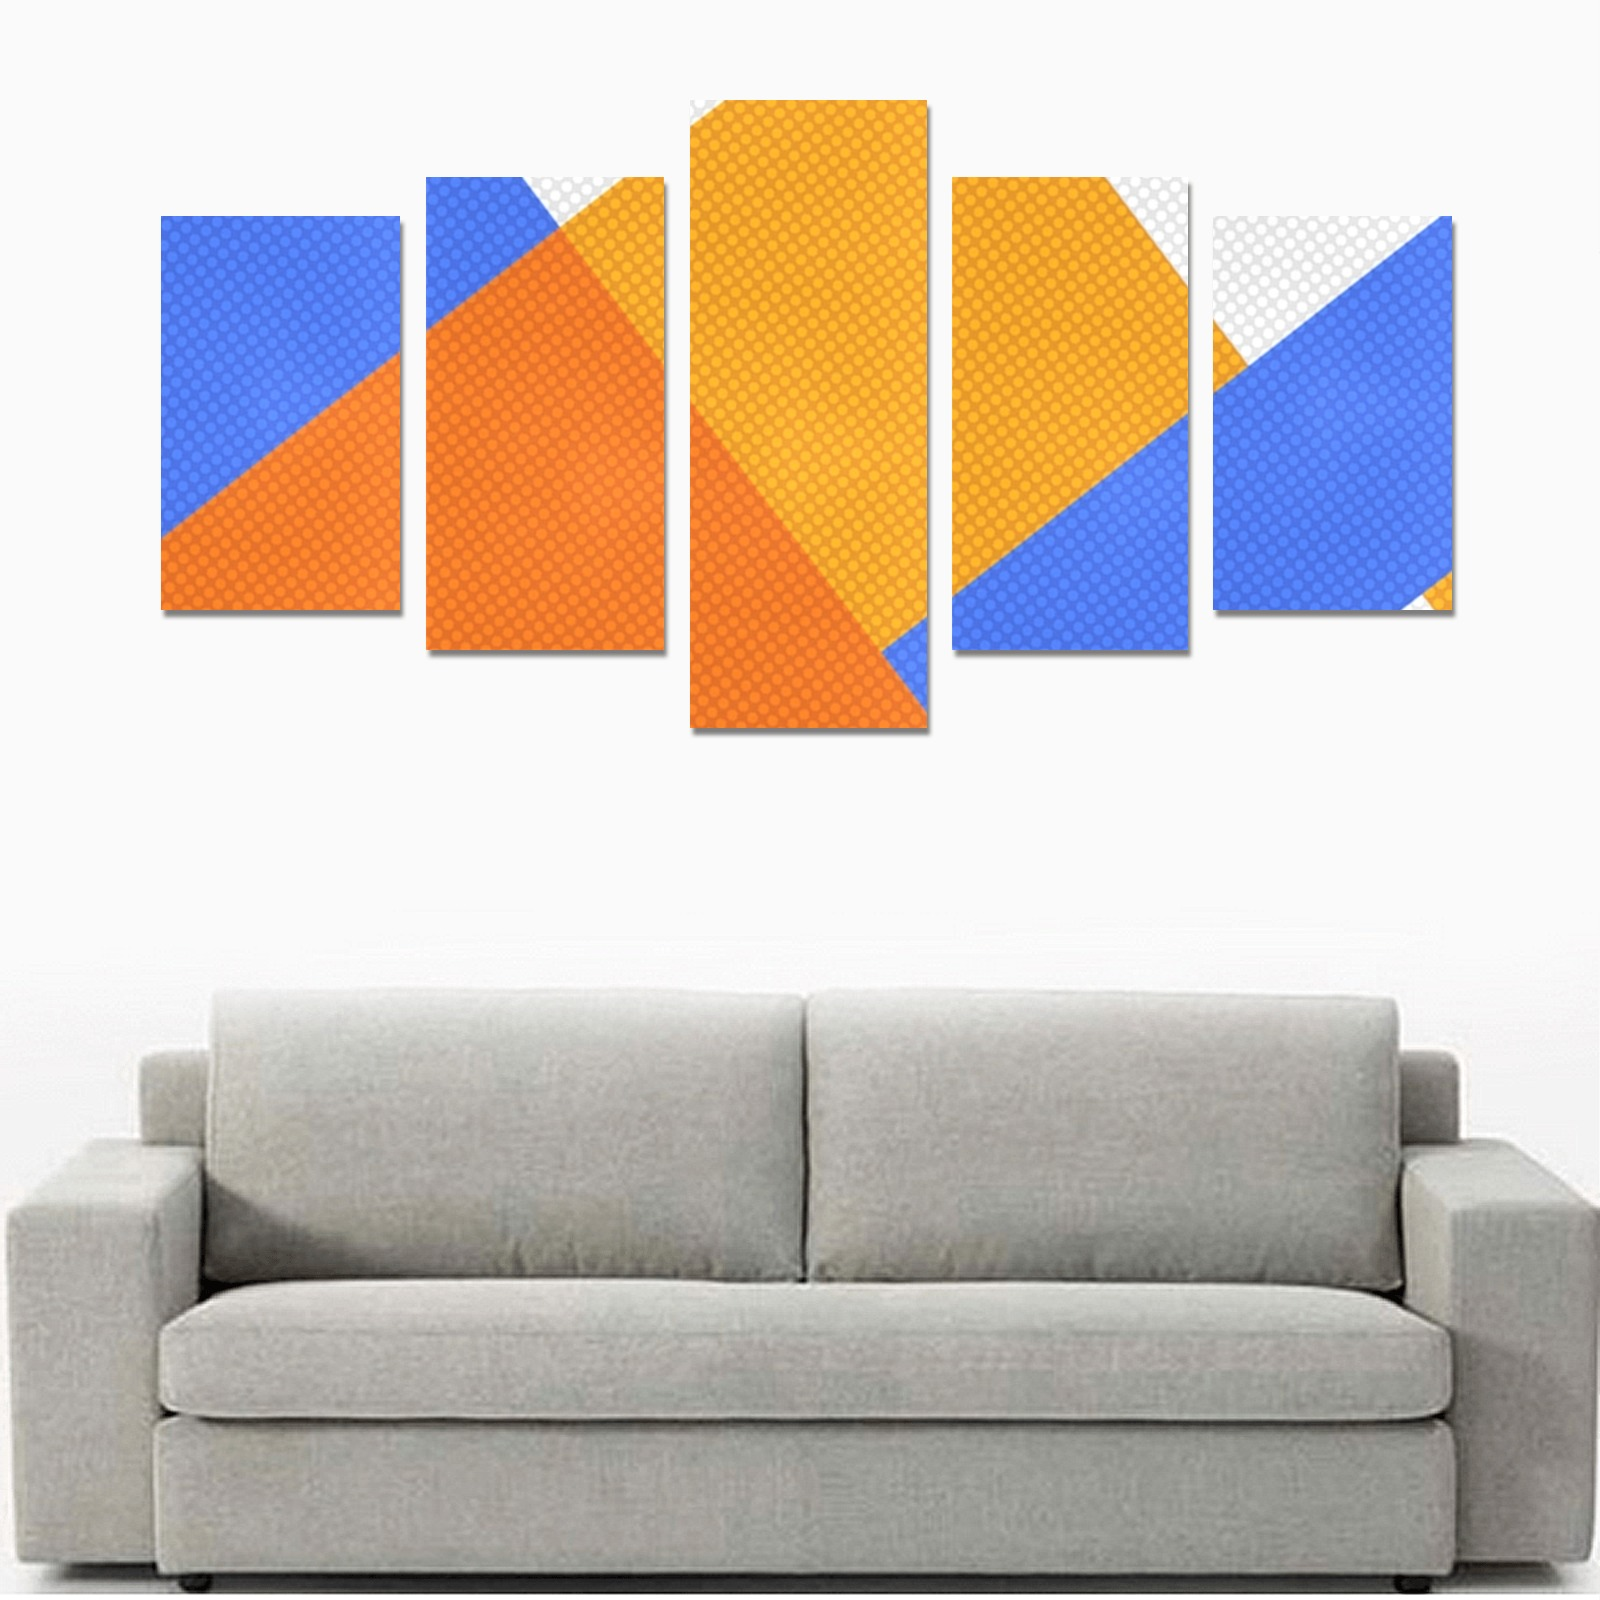 DESIGN 7575 Canvas Print Sets C (No Frame)